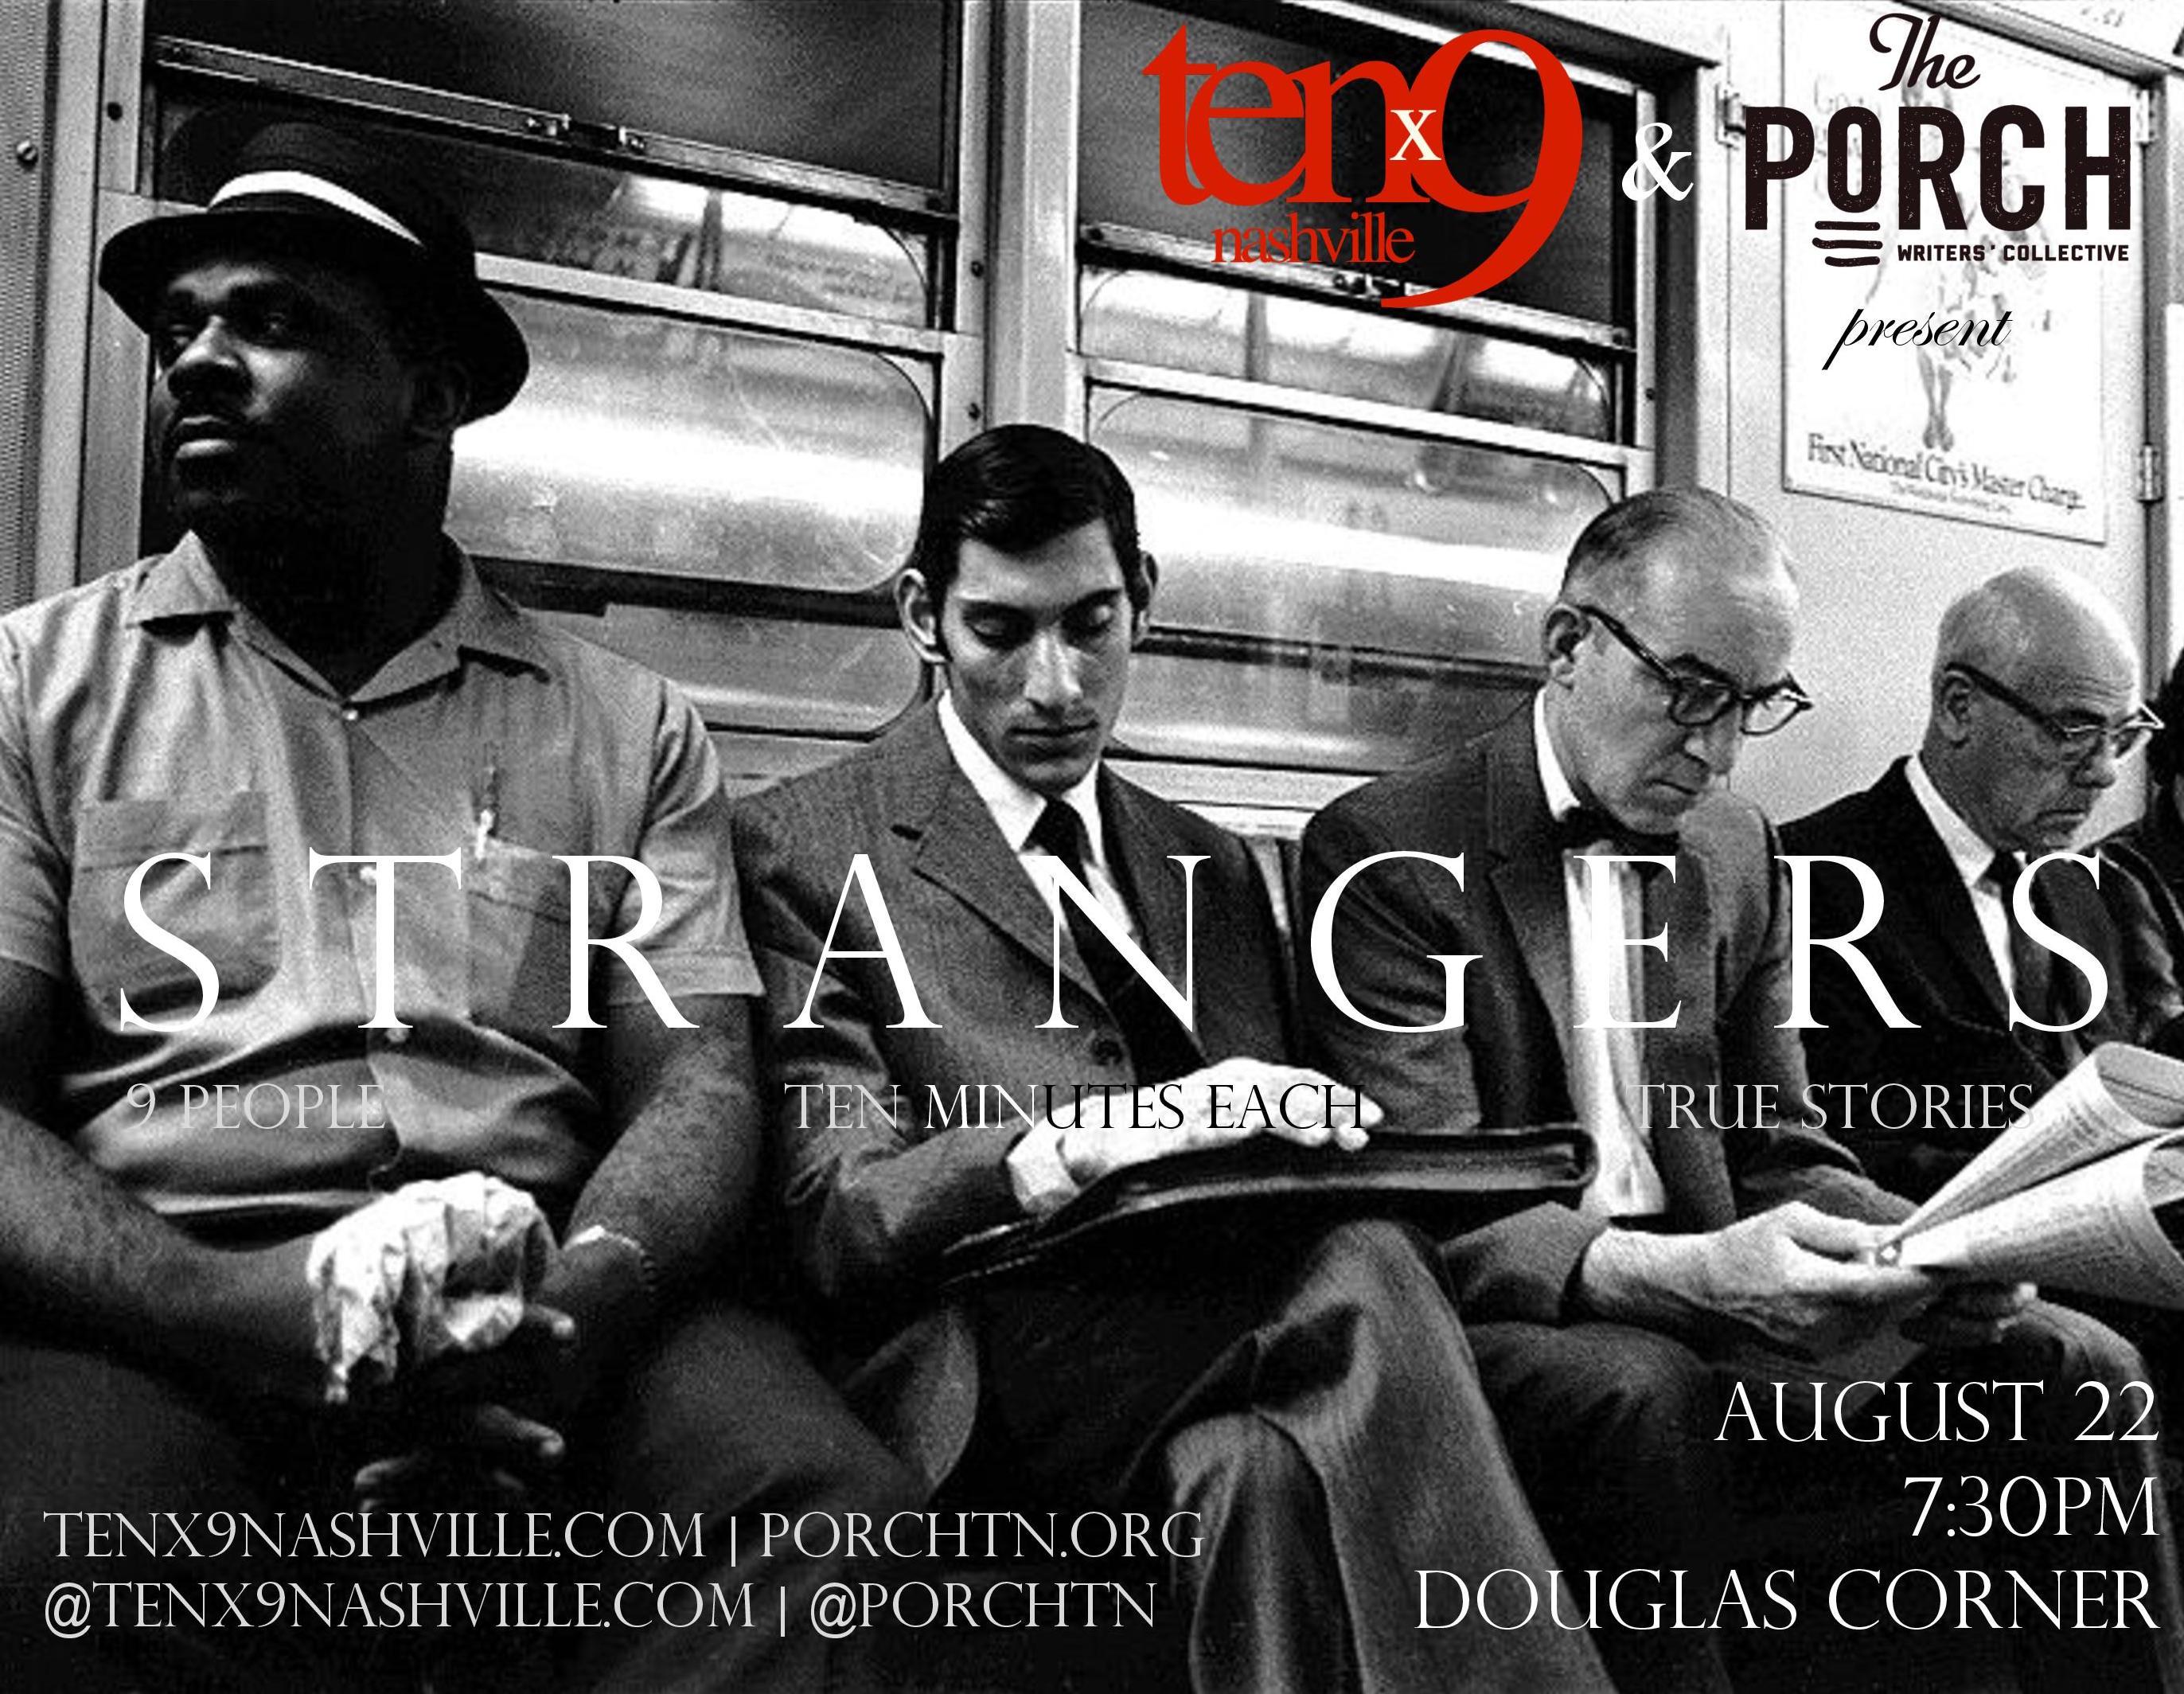 38-Strangers